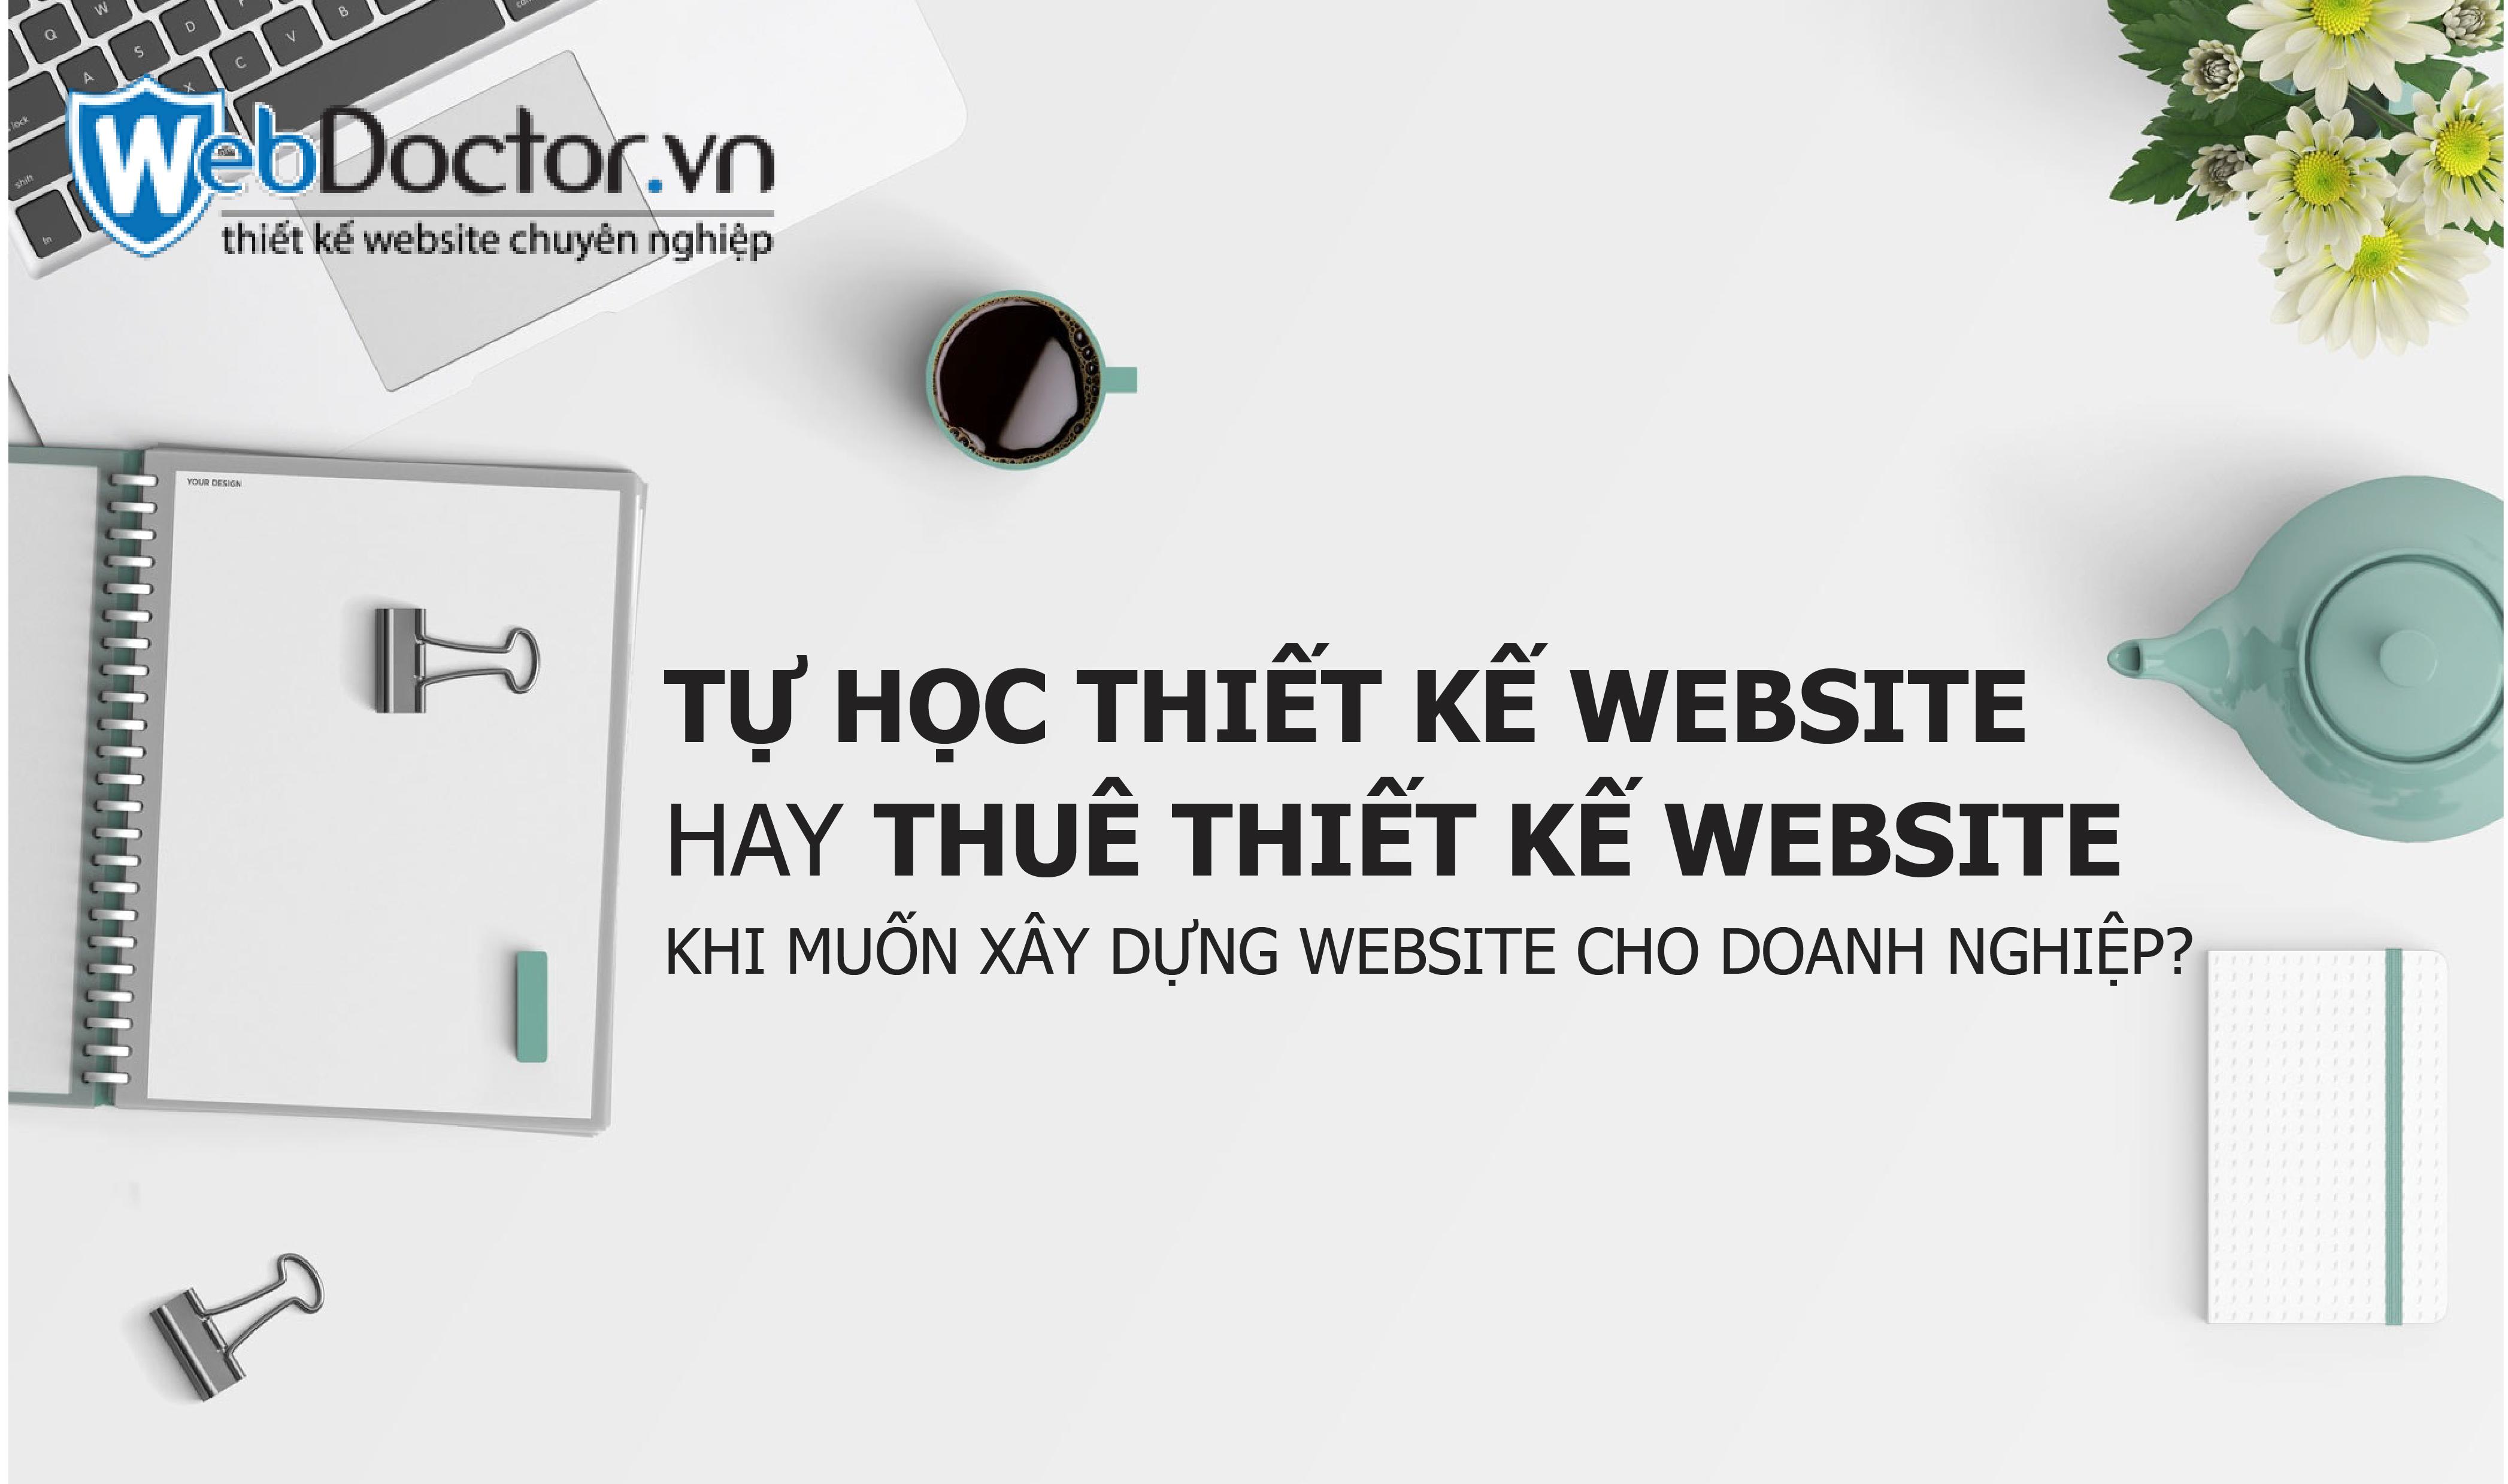 tự học thiết kế website hay thuê thiết kế website 01